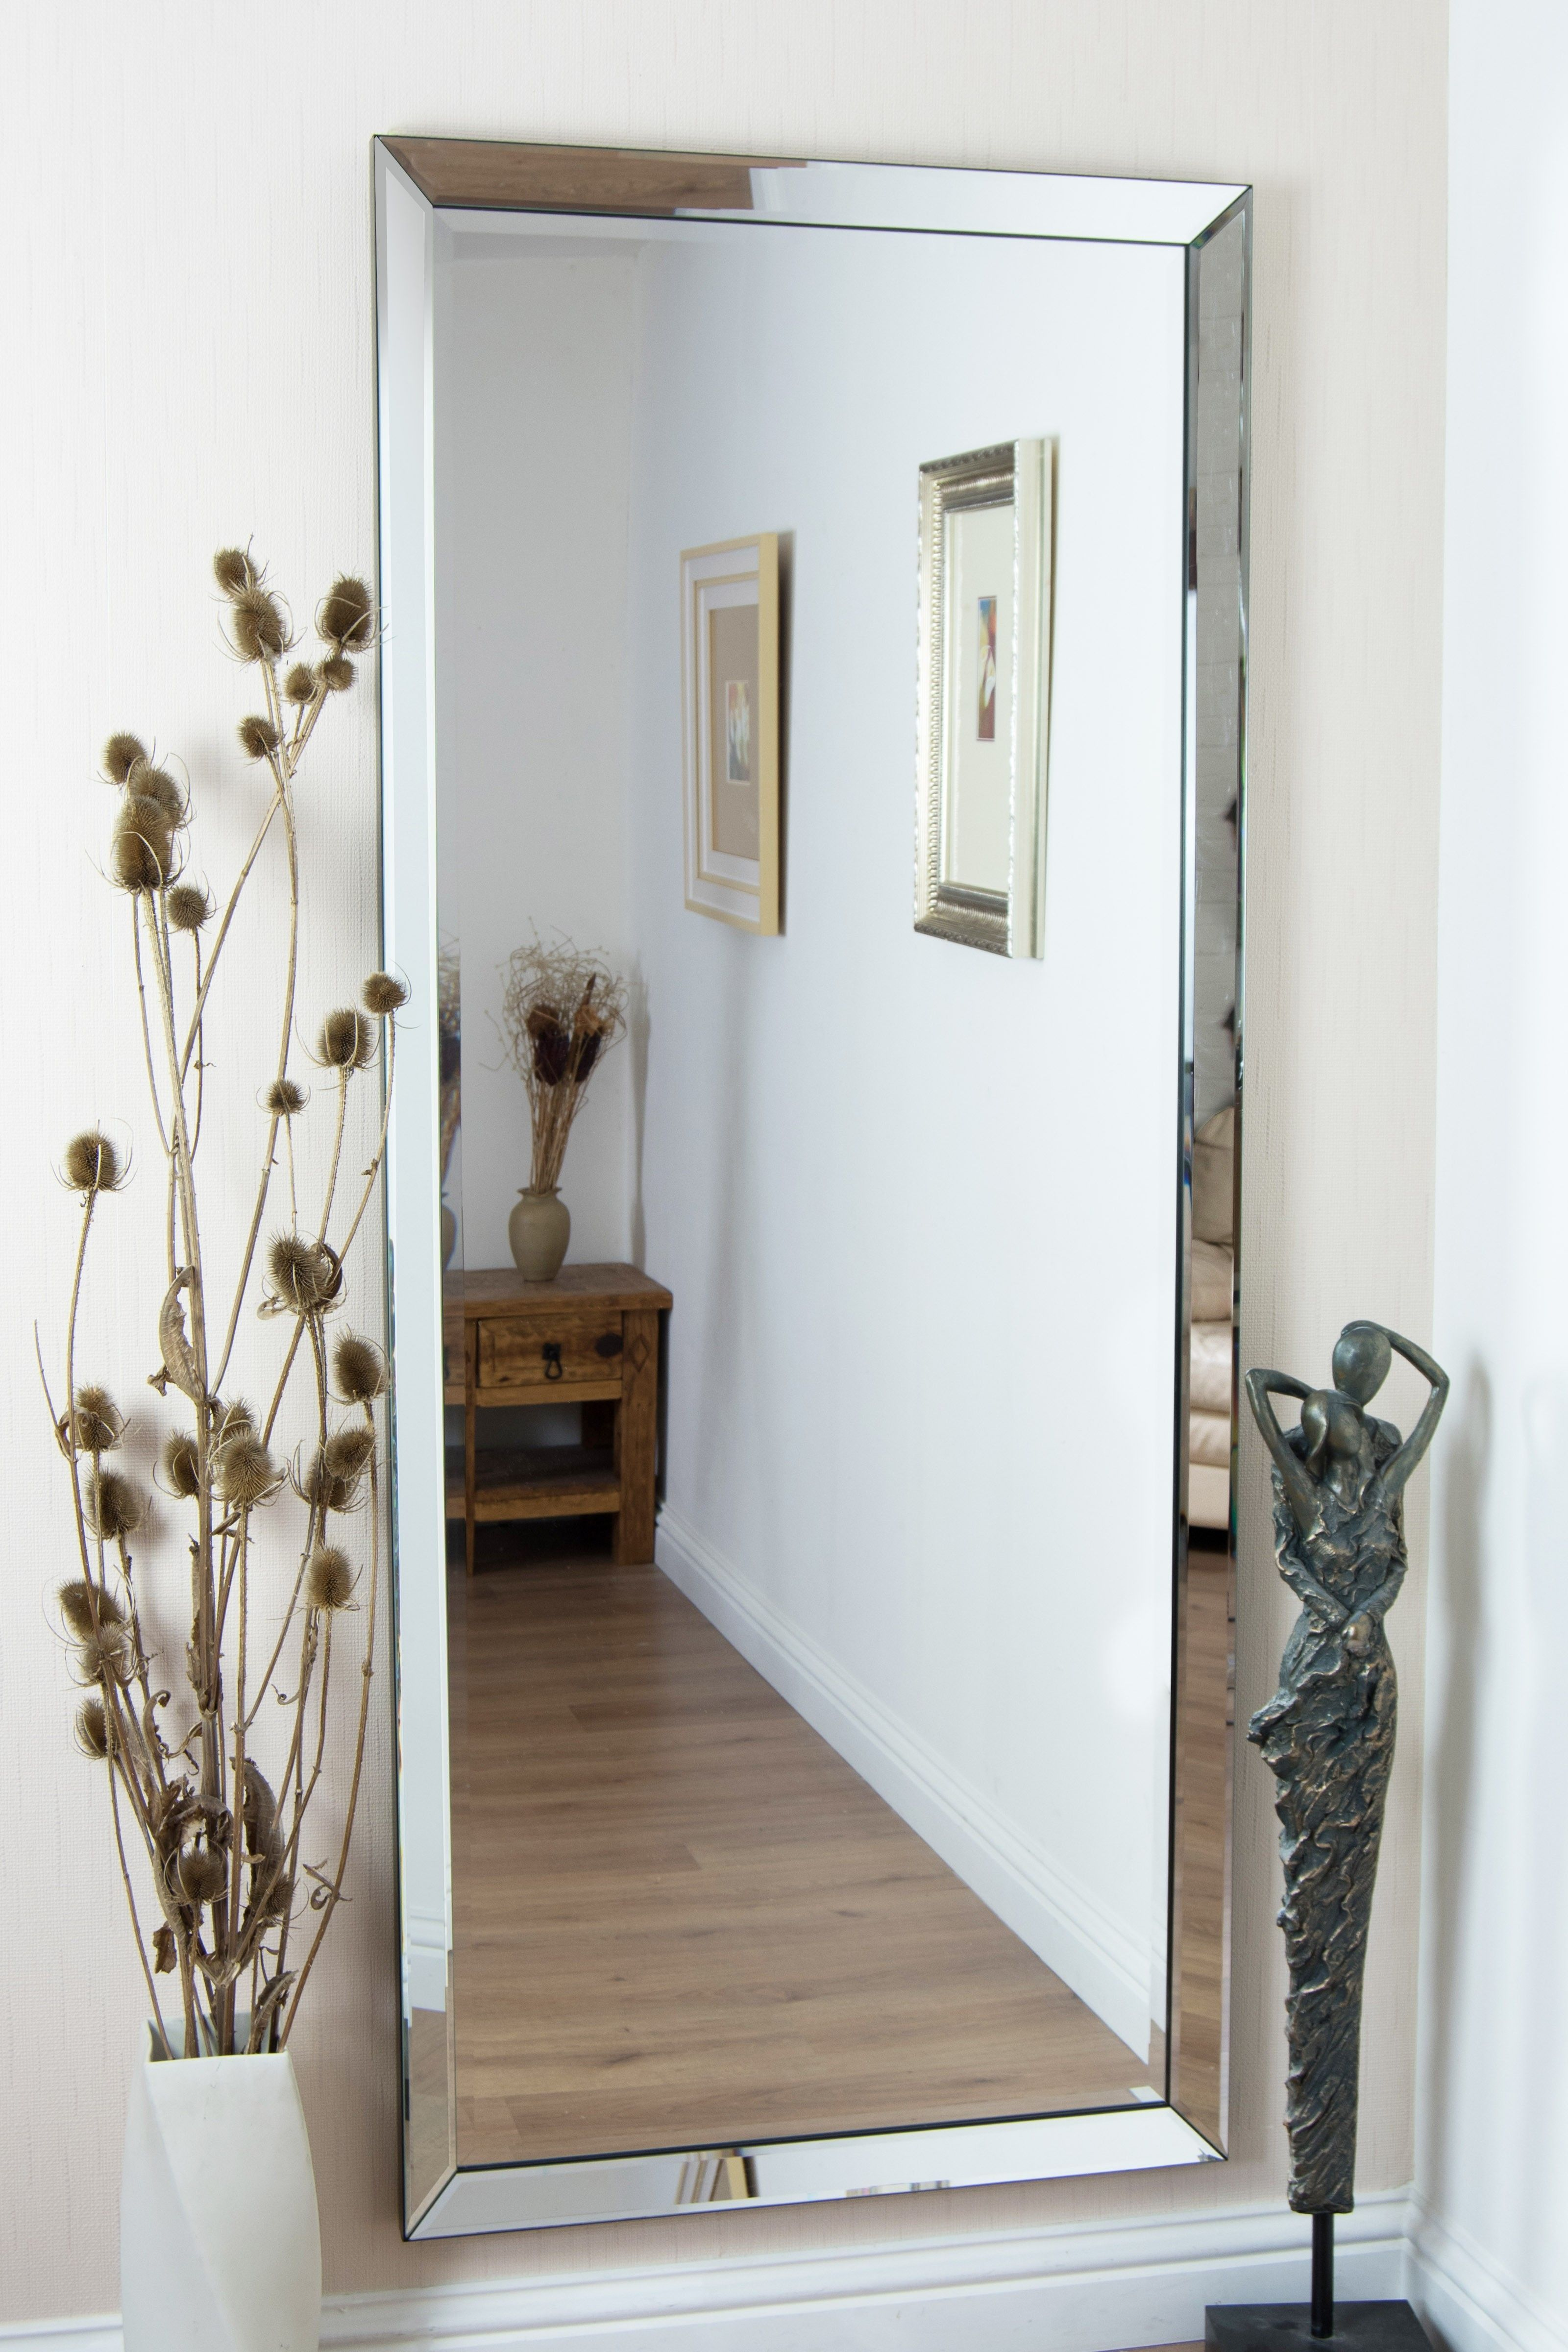 Large Rectangle Bathroom Mirror Hang Mirror On Wall Frameless Mirror Wall Bedroom Modern Mirror Wall Big Wall Mirrors #rectangle #mirrors #for #living #room